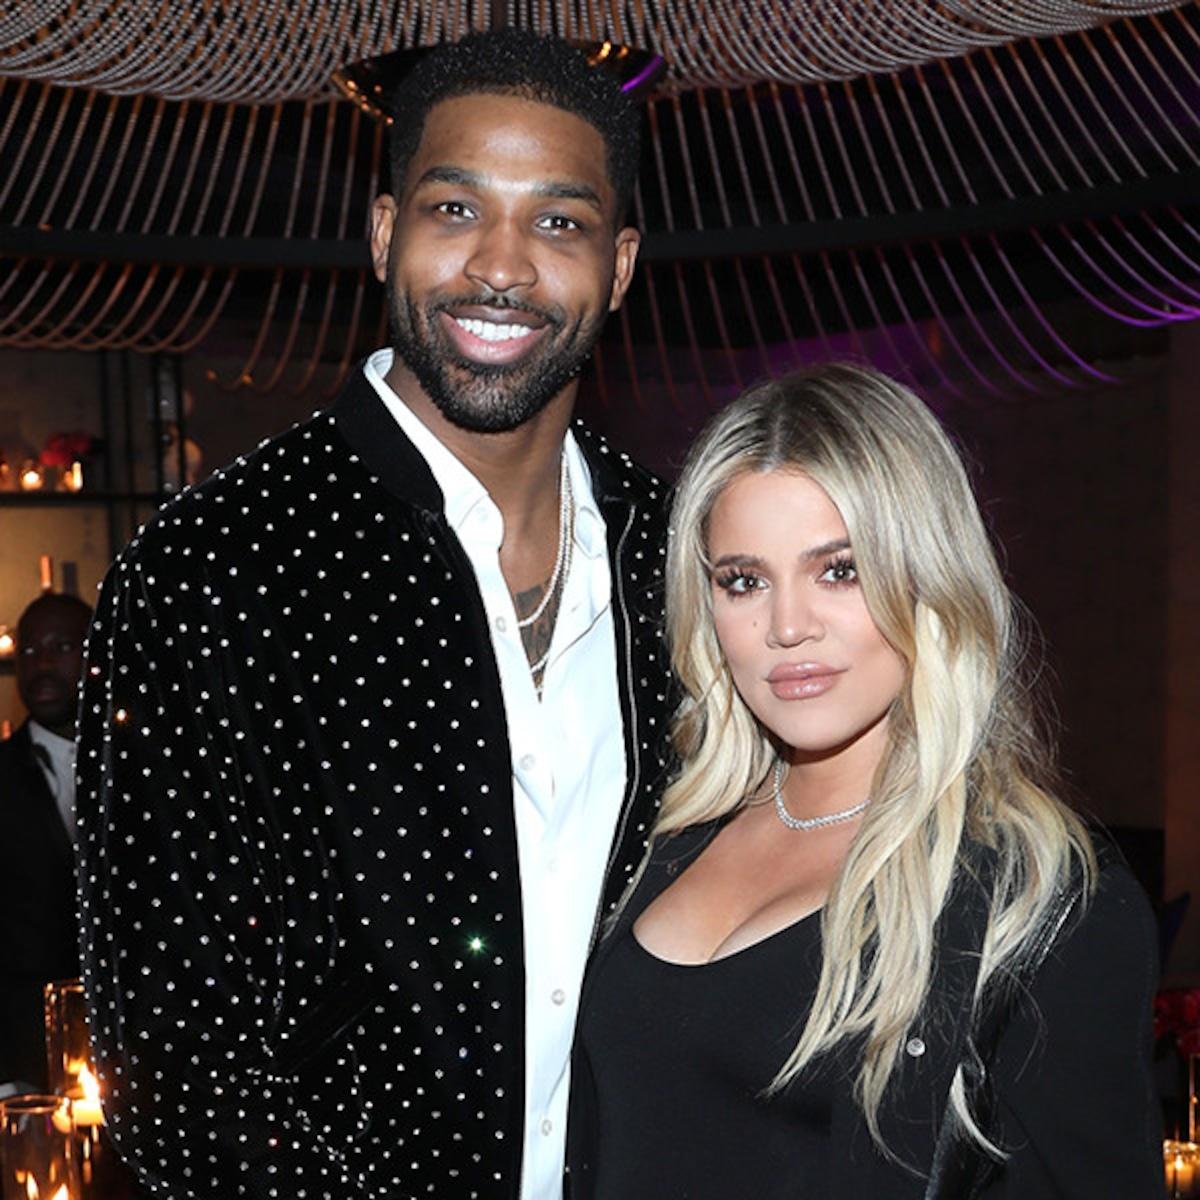 El reencuentro navideño de Khloé Kardashian y Tristan Thompson - E! Online  Latino - VE